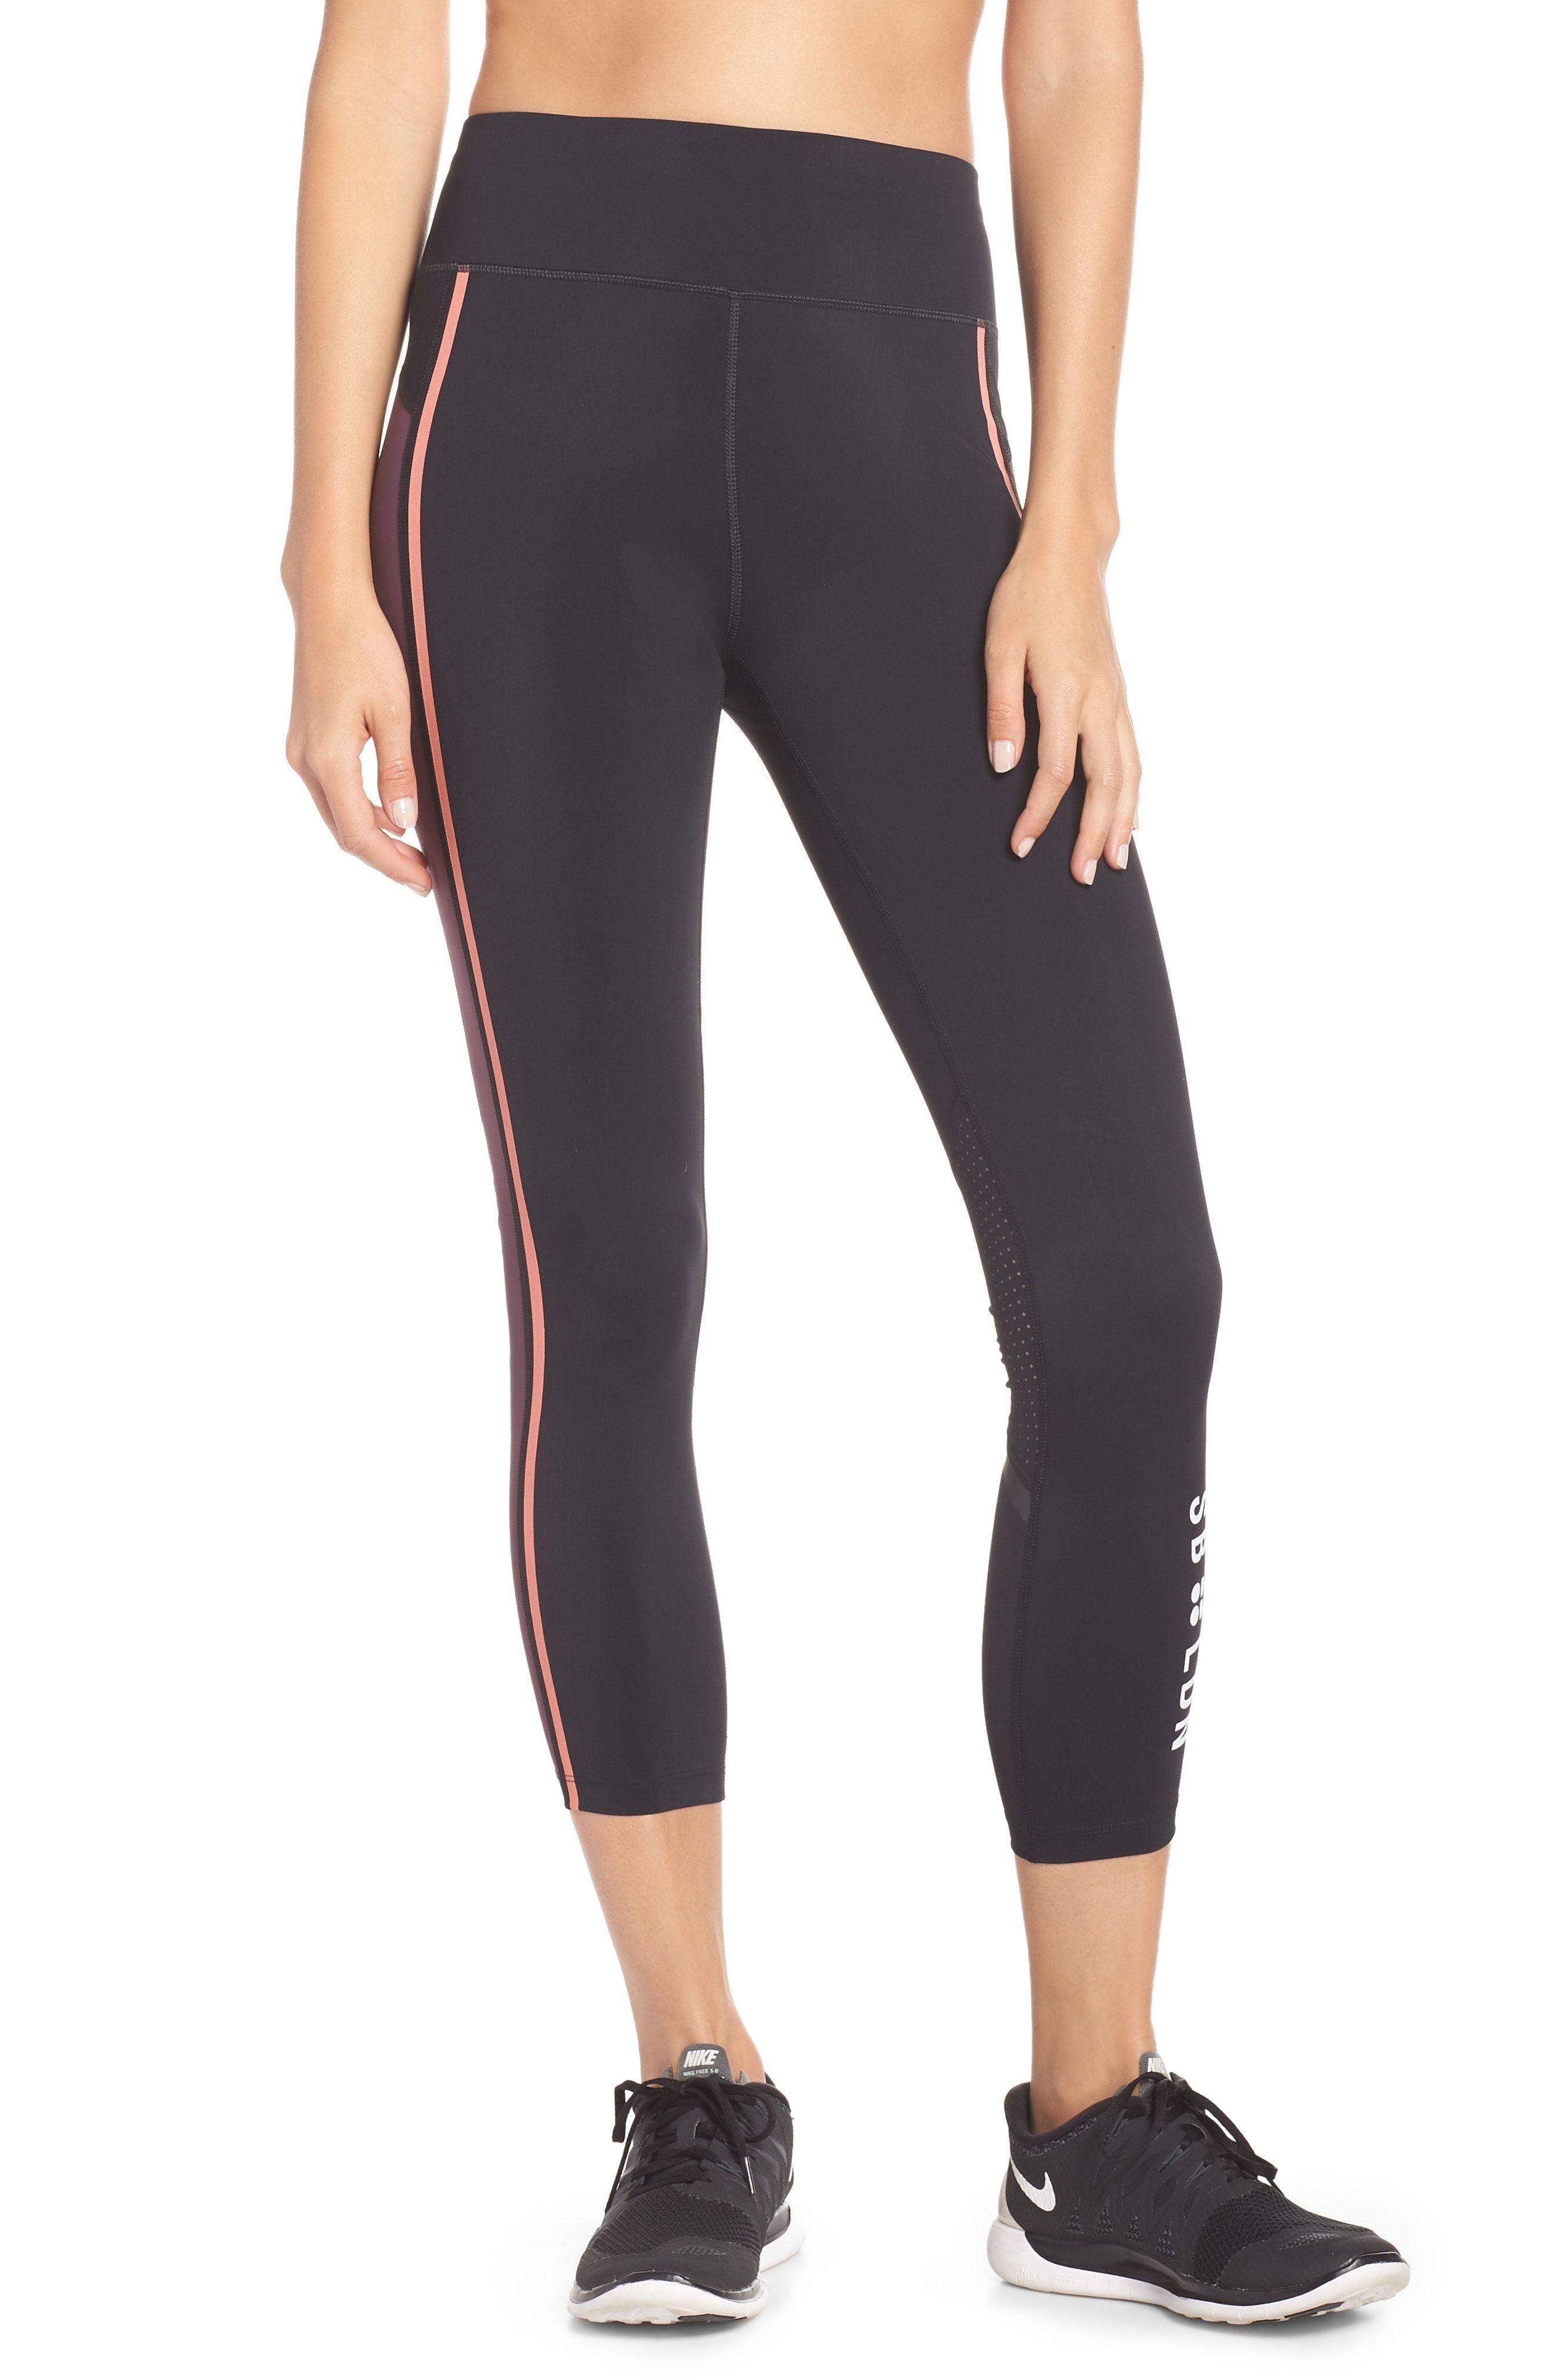 fashion modern design great look Best for Pilates: Sweaty Betty Zero Gravity Ankle Leggings